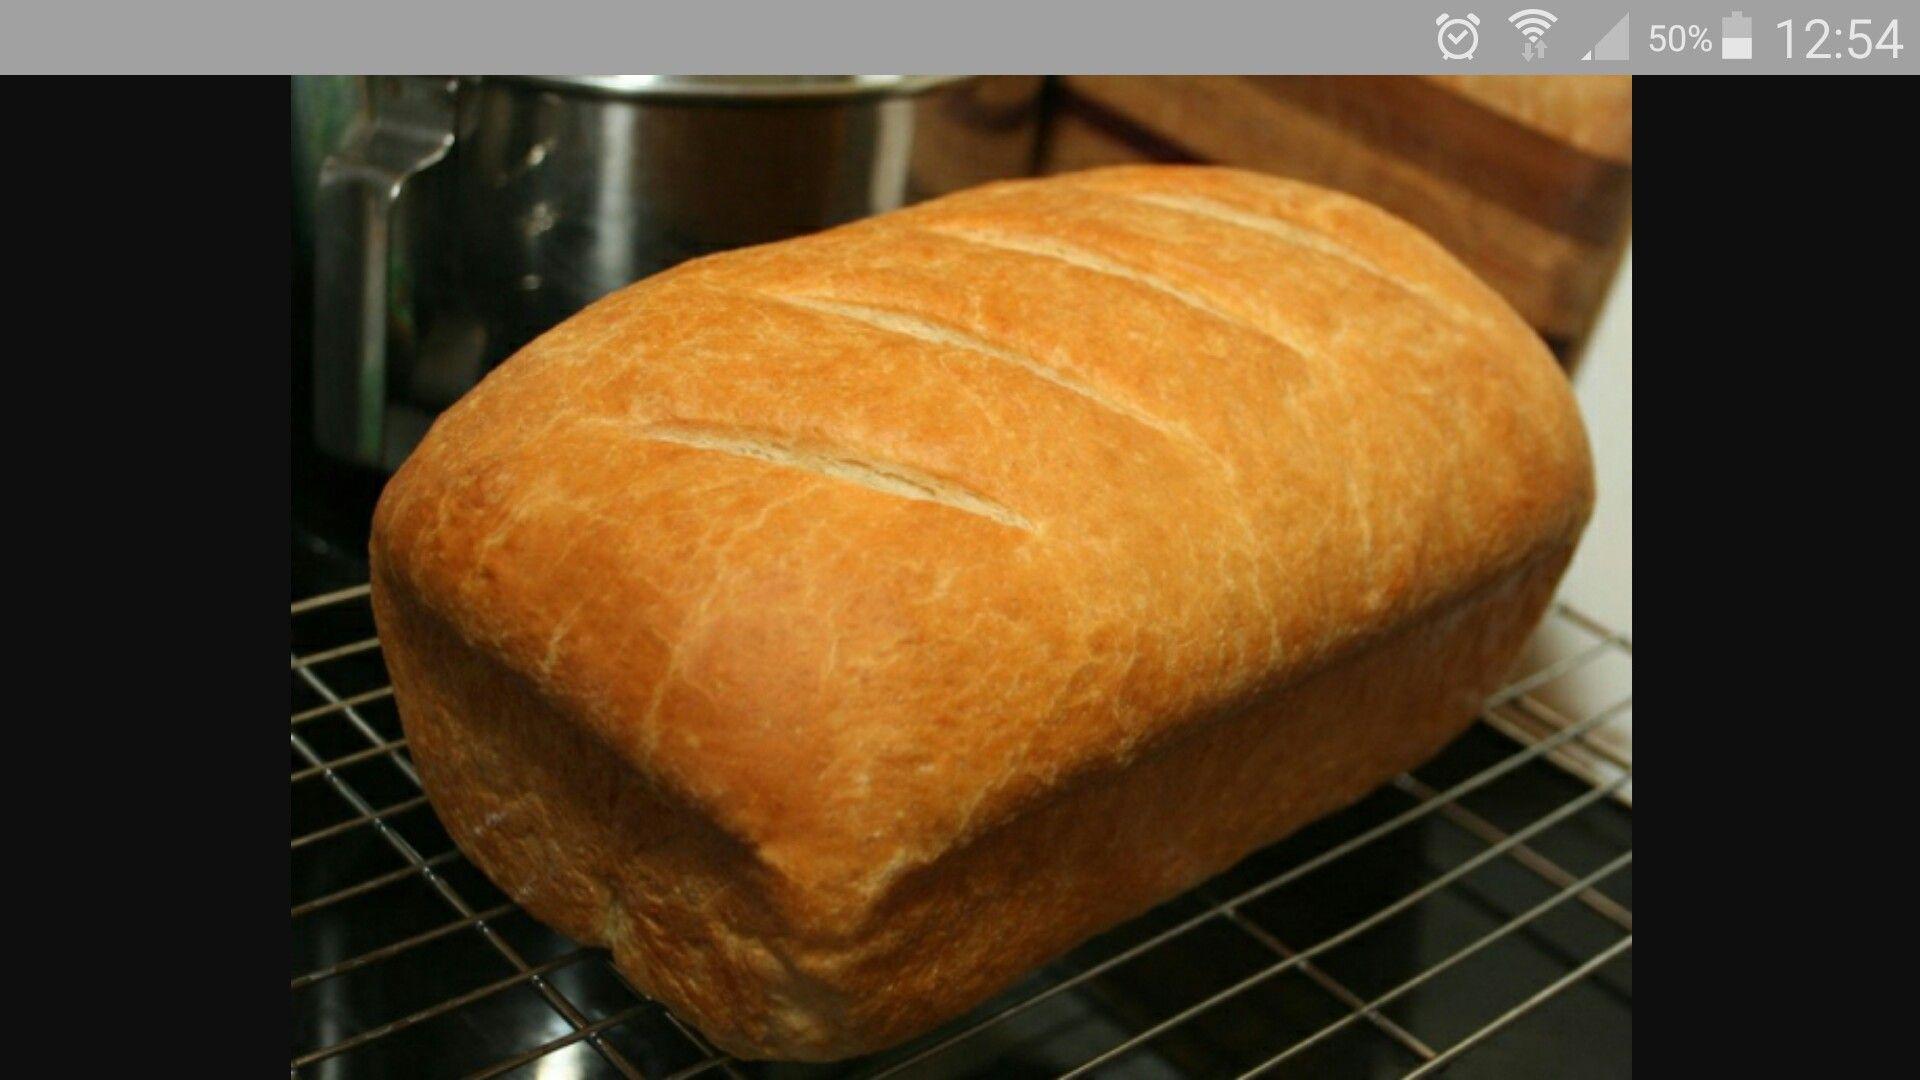 Receta De Pan Sin Gluten Receta Pan Sin Gluten Sin Gluten Pan Sin Gluten Recetas